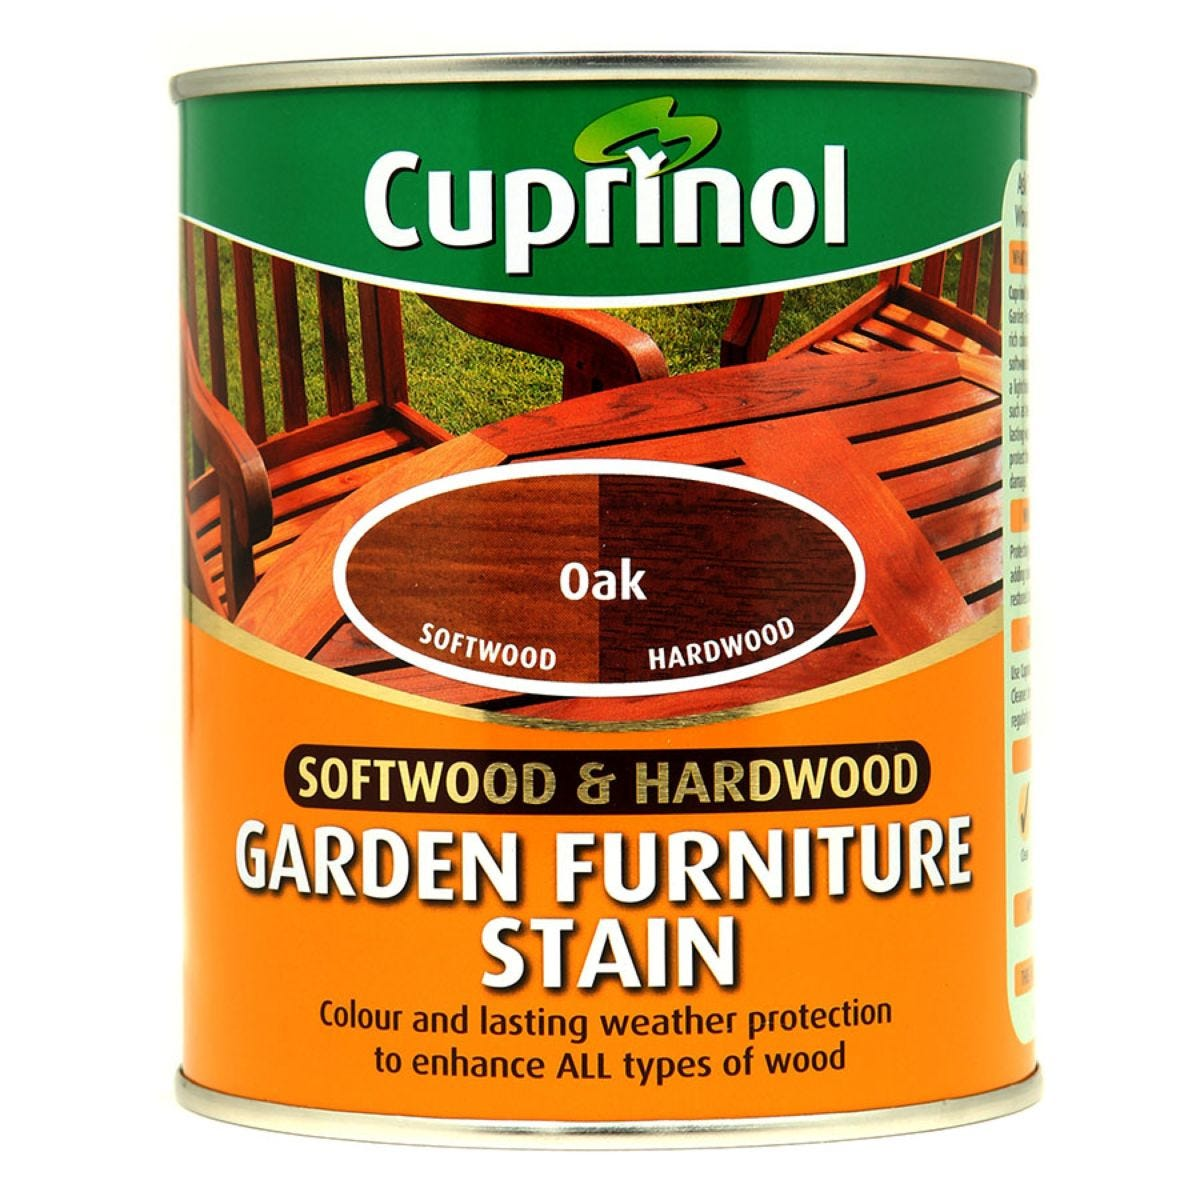 Cuprinol 750ml Garden Furniture Stain – Oak